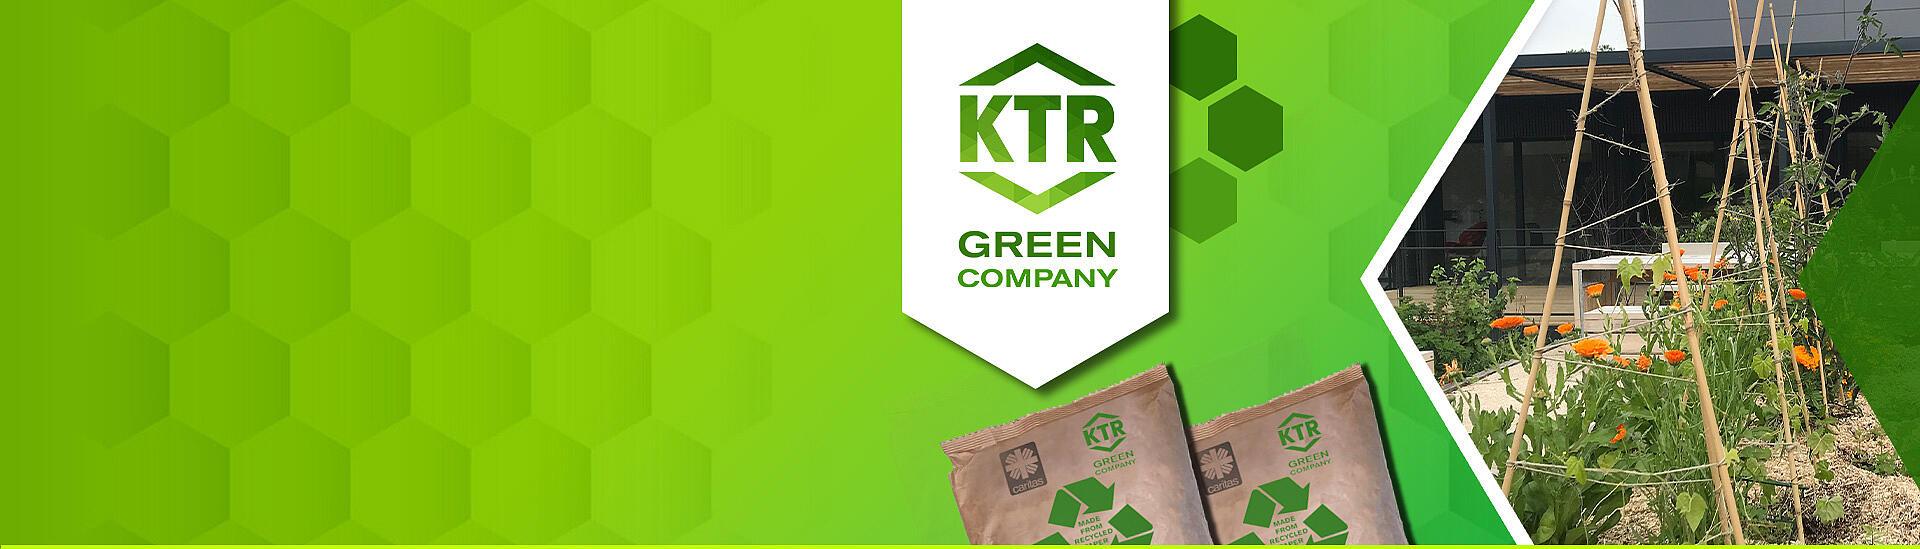 KTR green company | KTR Systems